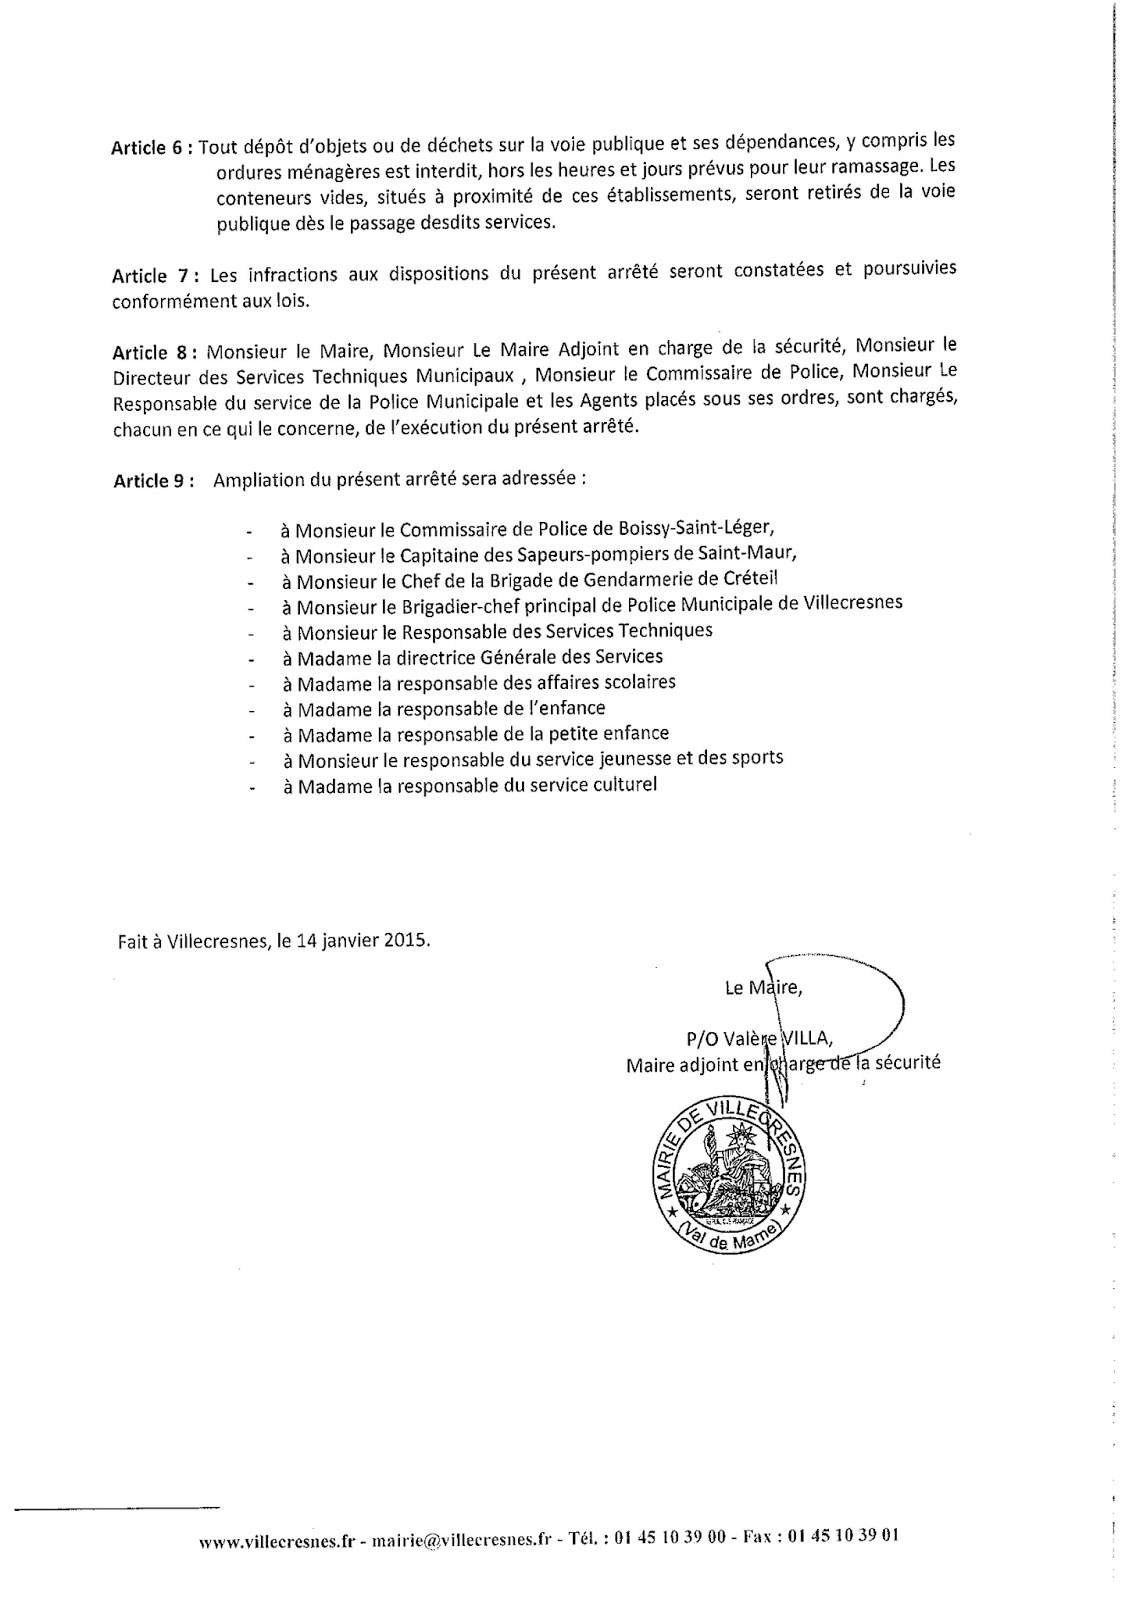 2015-004 Application du plan vigipirate niveau Alerte attentat du 8 janvier 2015